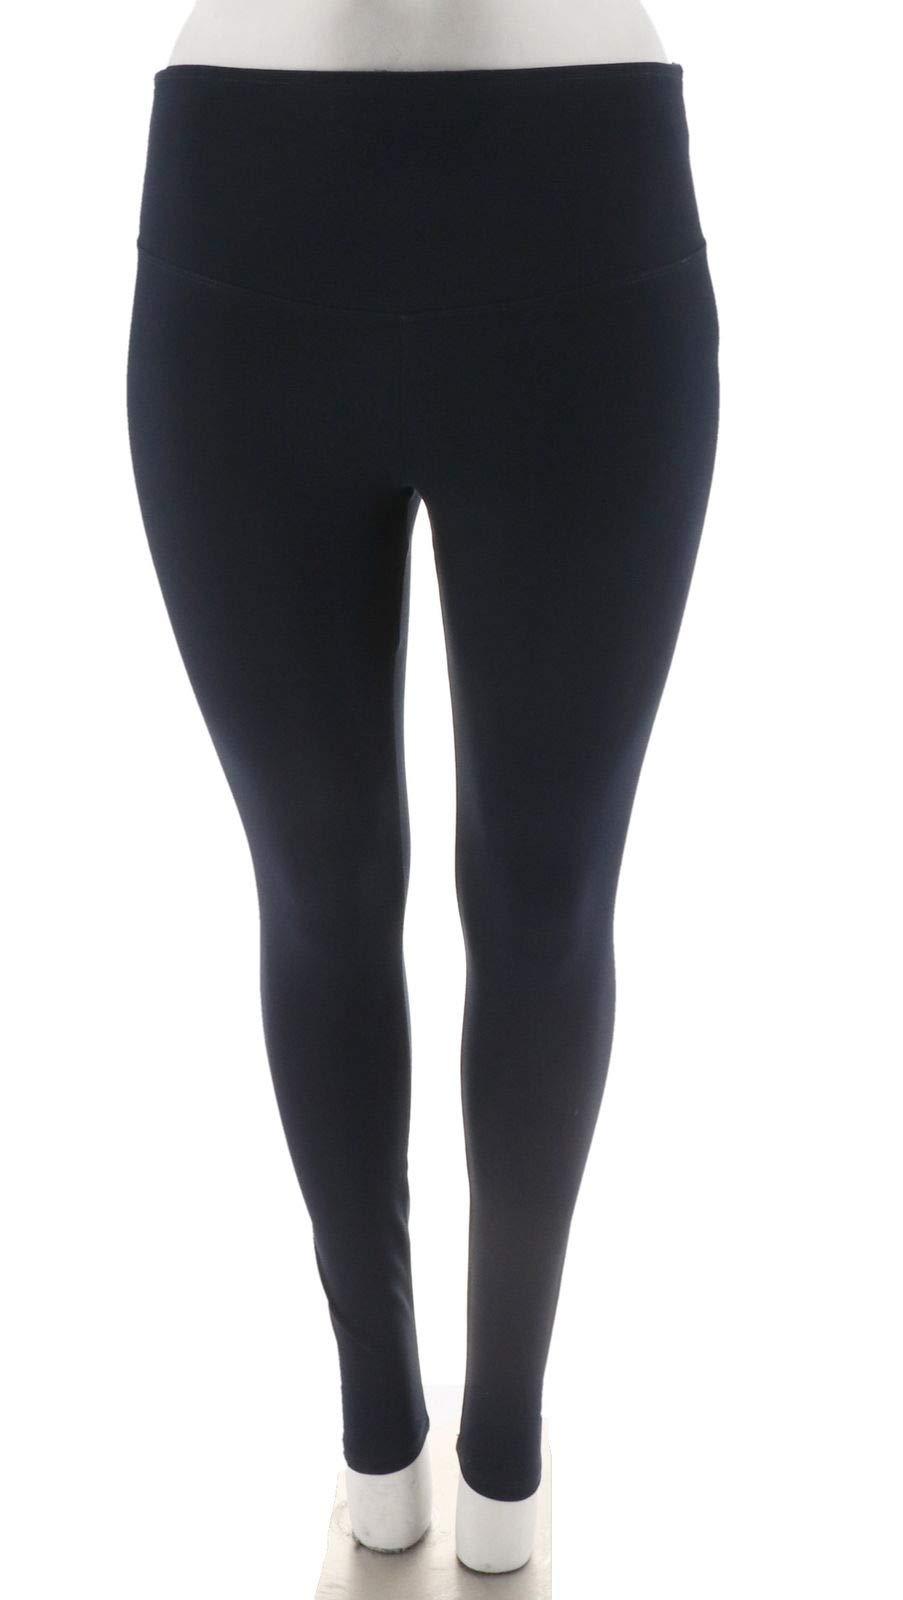 Yummie Compact Cotton Full Length Leggings A296343, Peacoat, L